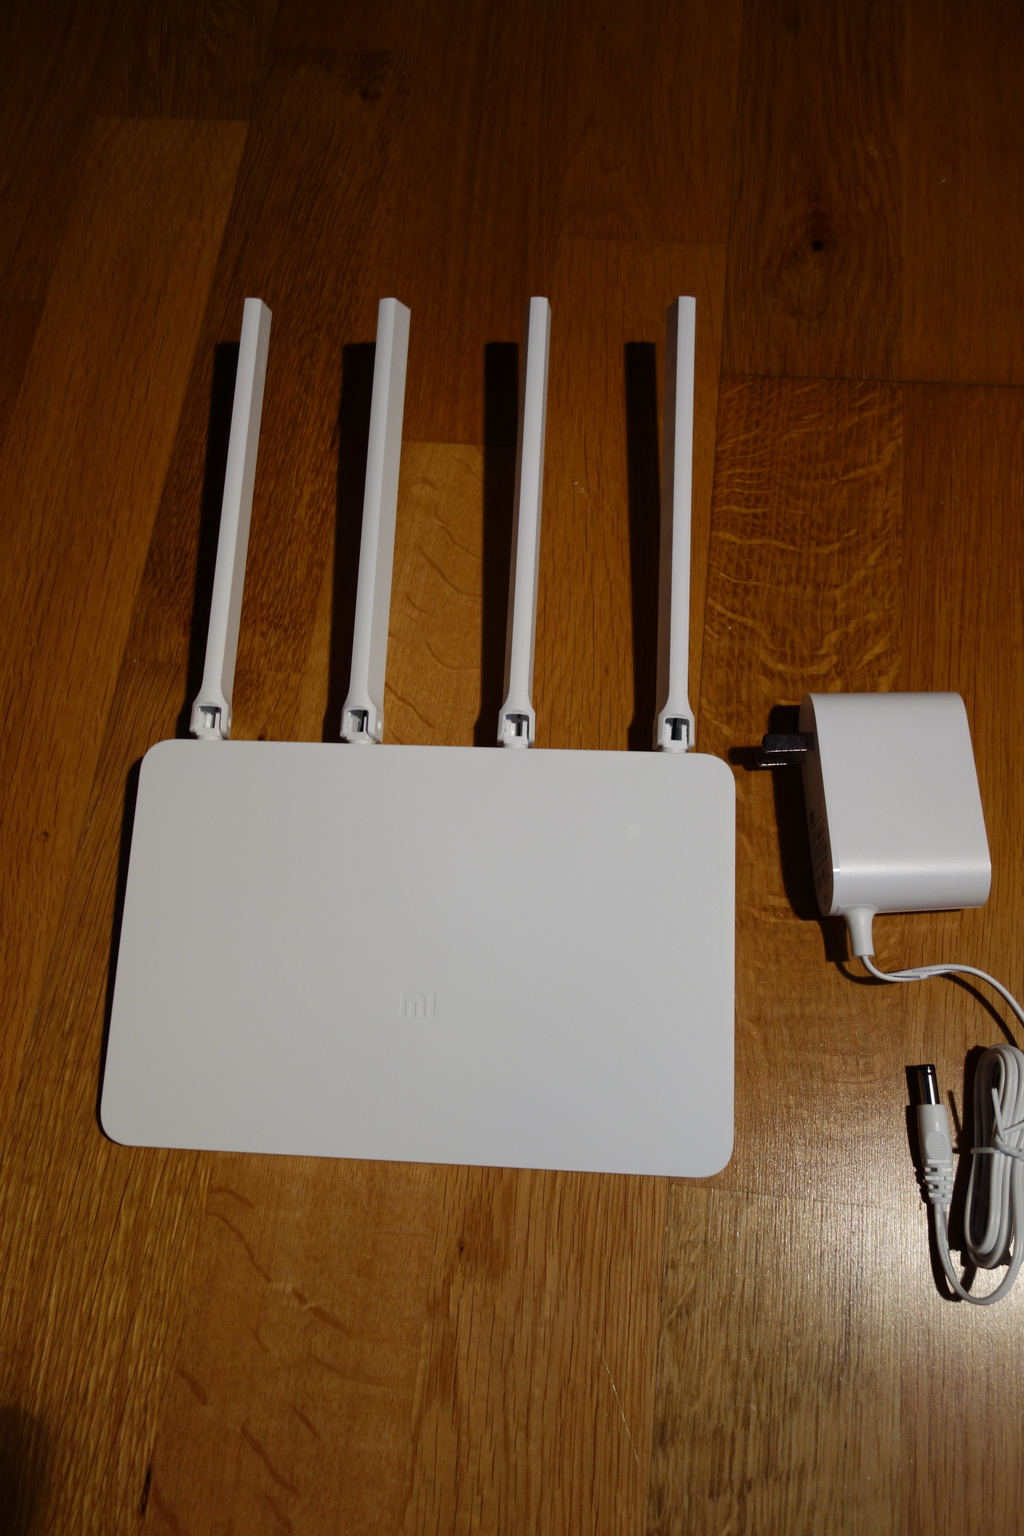 Xiaomi-Mi-WiFi-Router-3-11